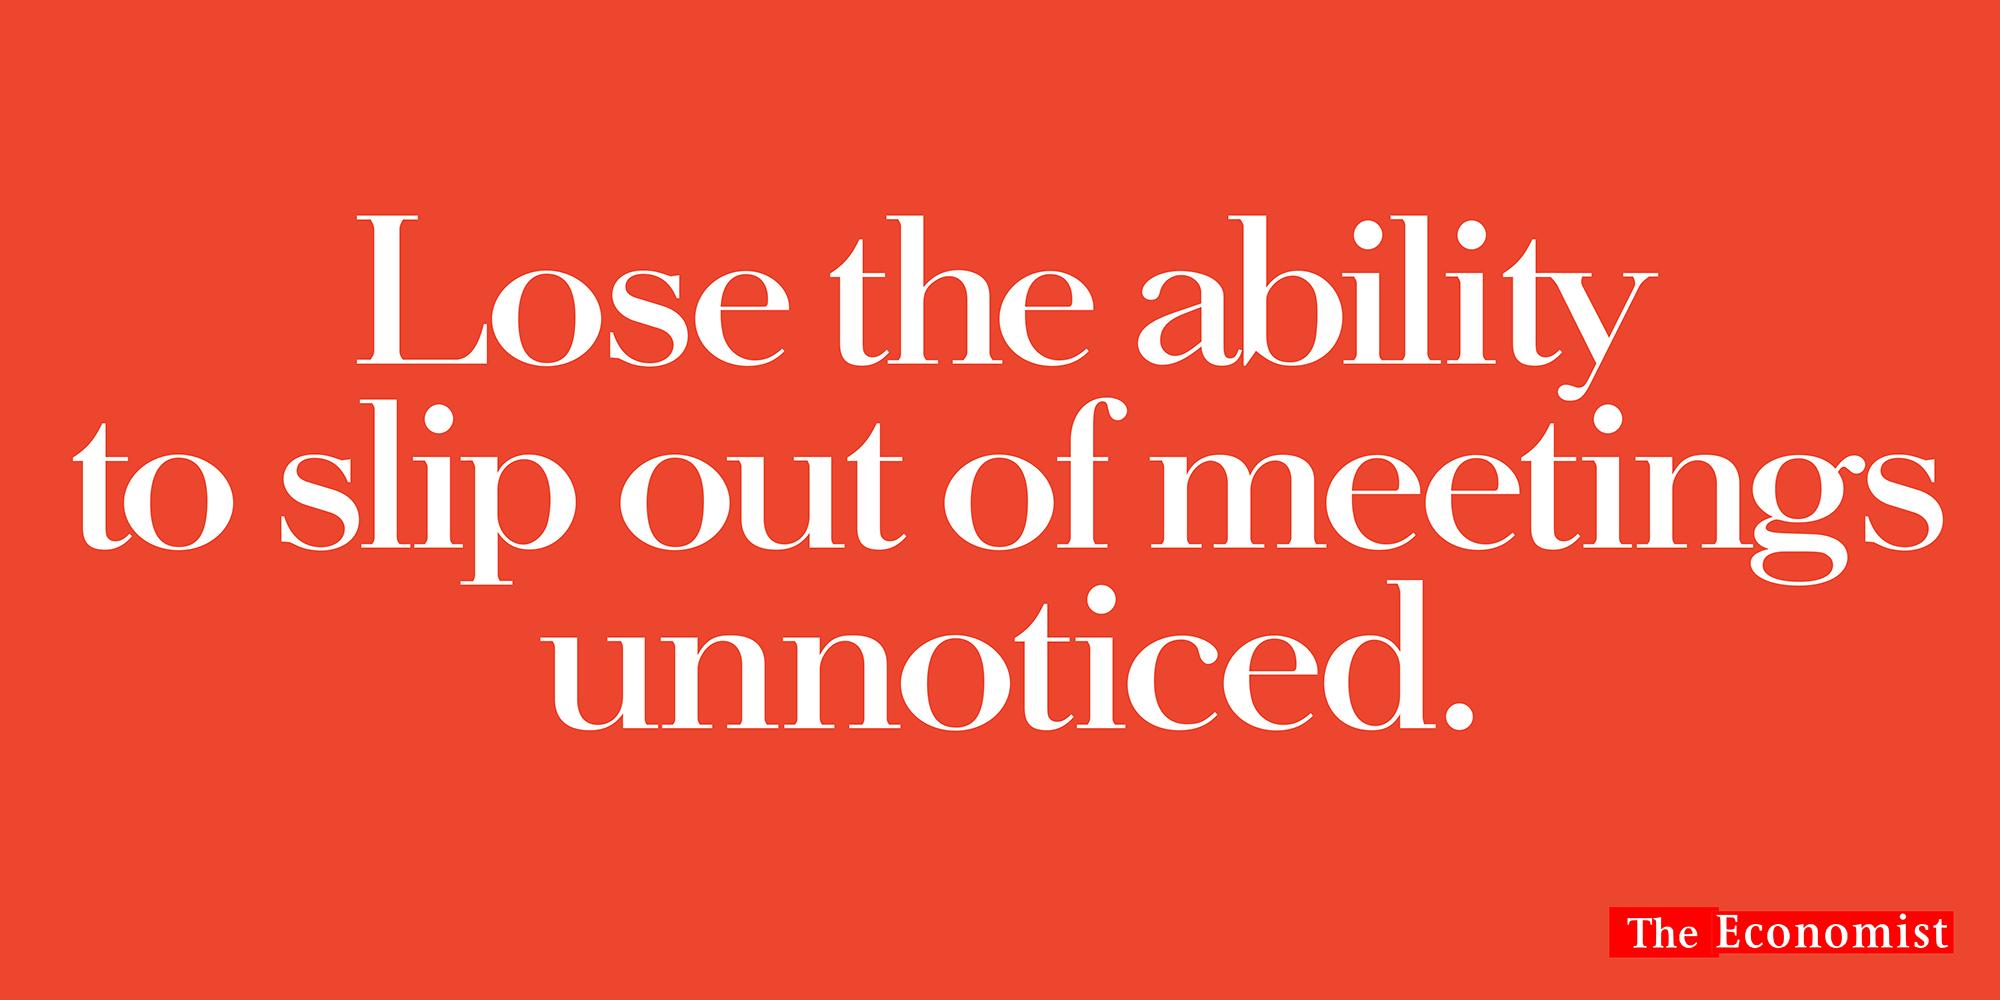 'Lose The Ability' The Economist, Dave Dye, AMV_BBDO